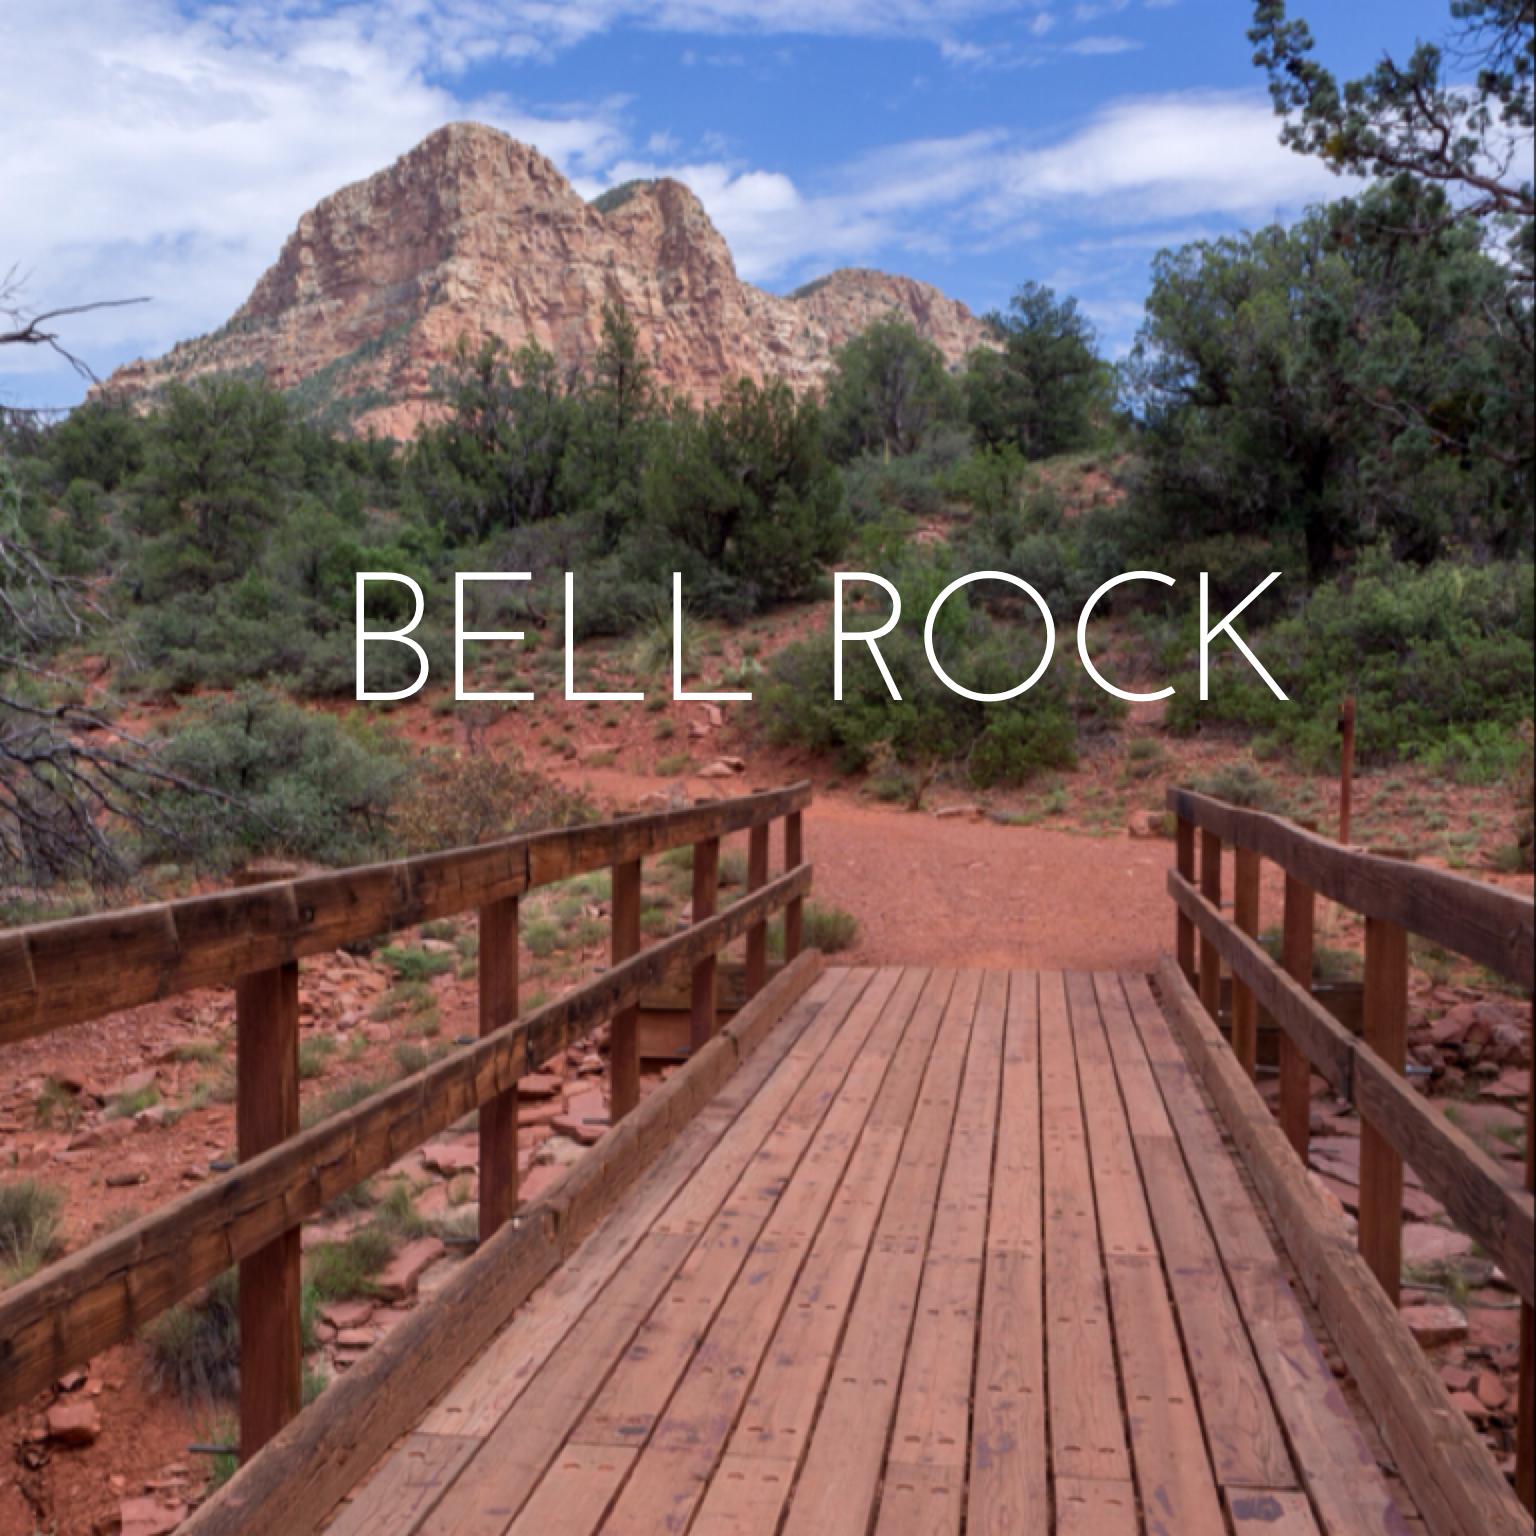 BellRockTitle.jpg